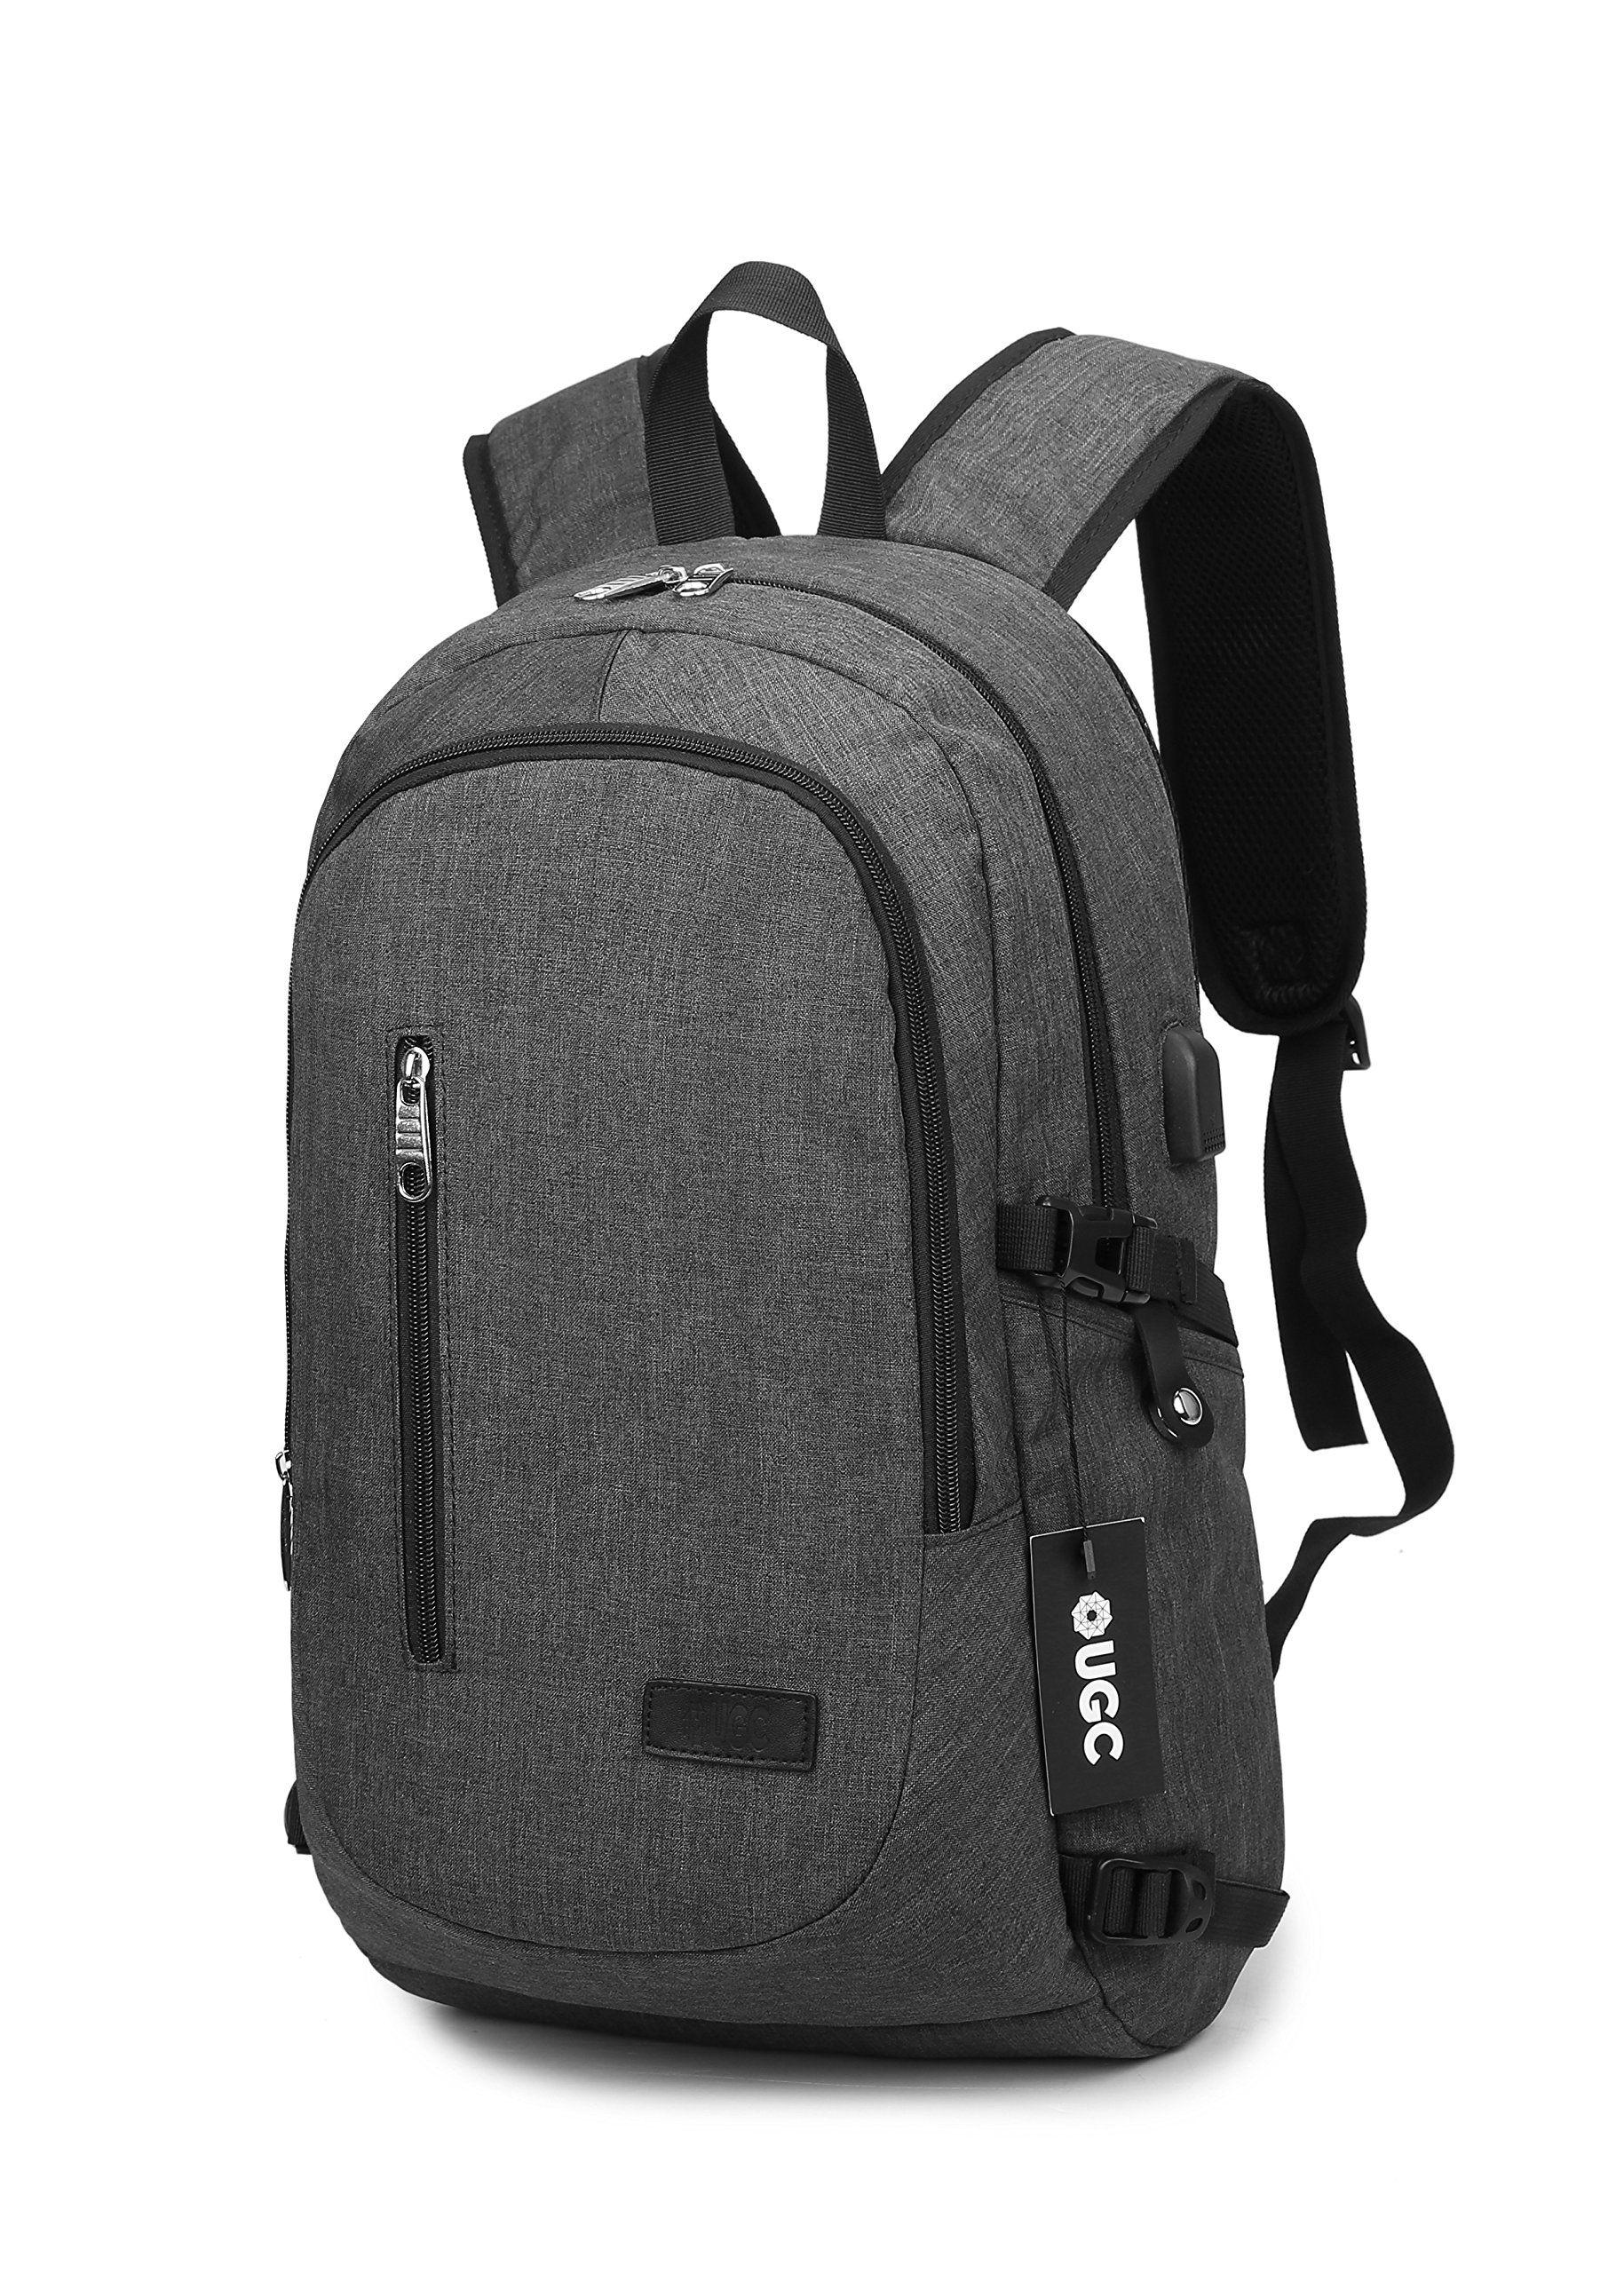 Best 17 Inch Laptop Backpack Uk- Fenix Toulouse Handball 86e5c8bddb1e7